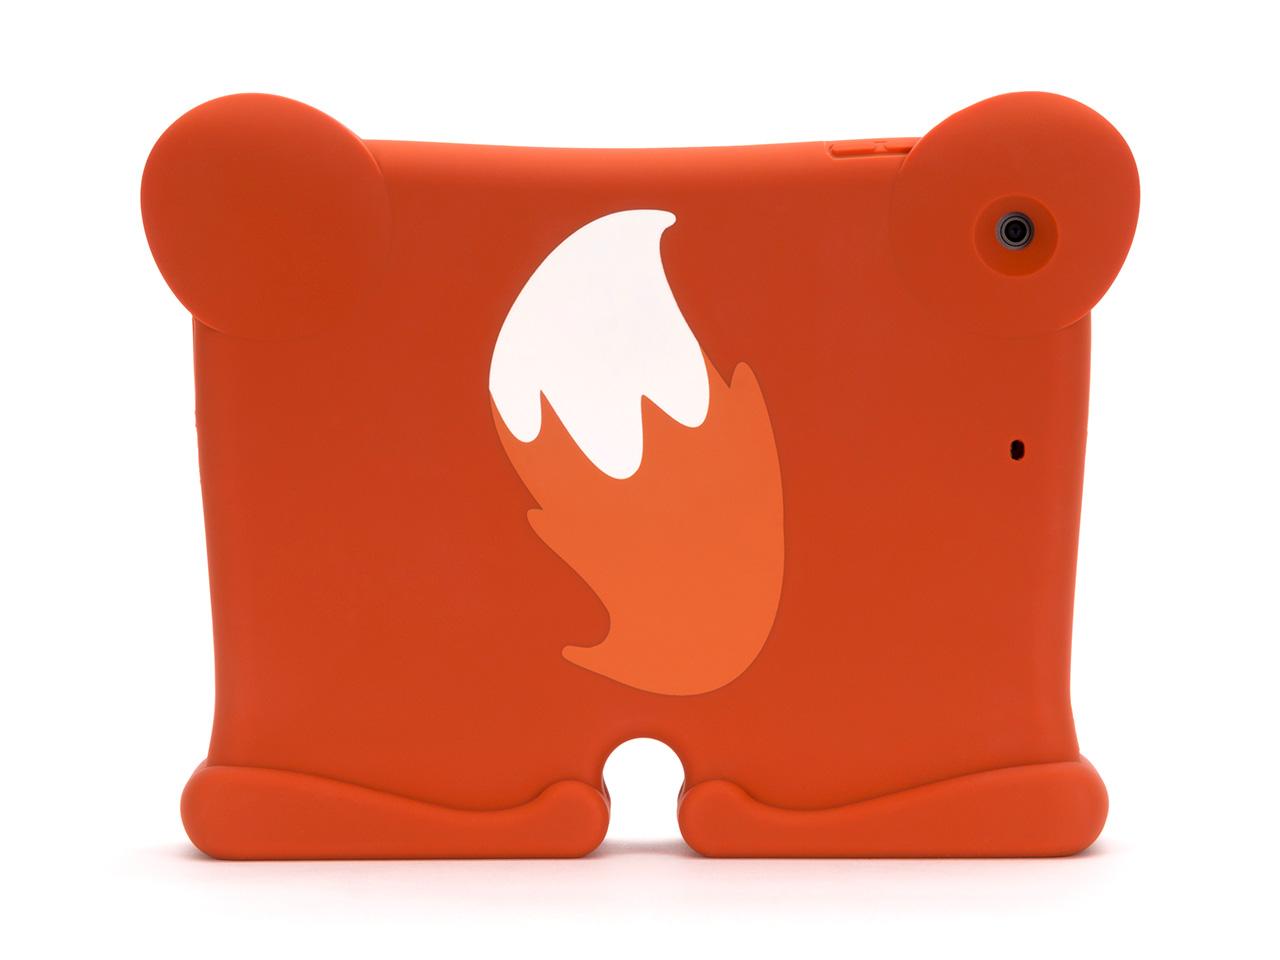 Fox KaZoo Animal Case for iPad mini